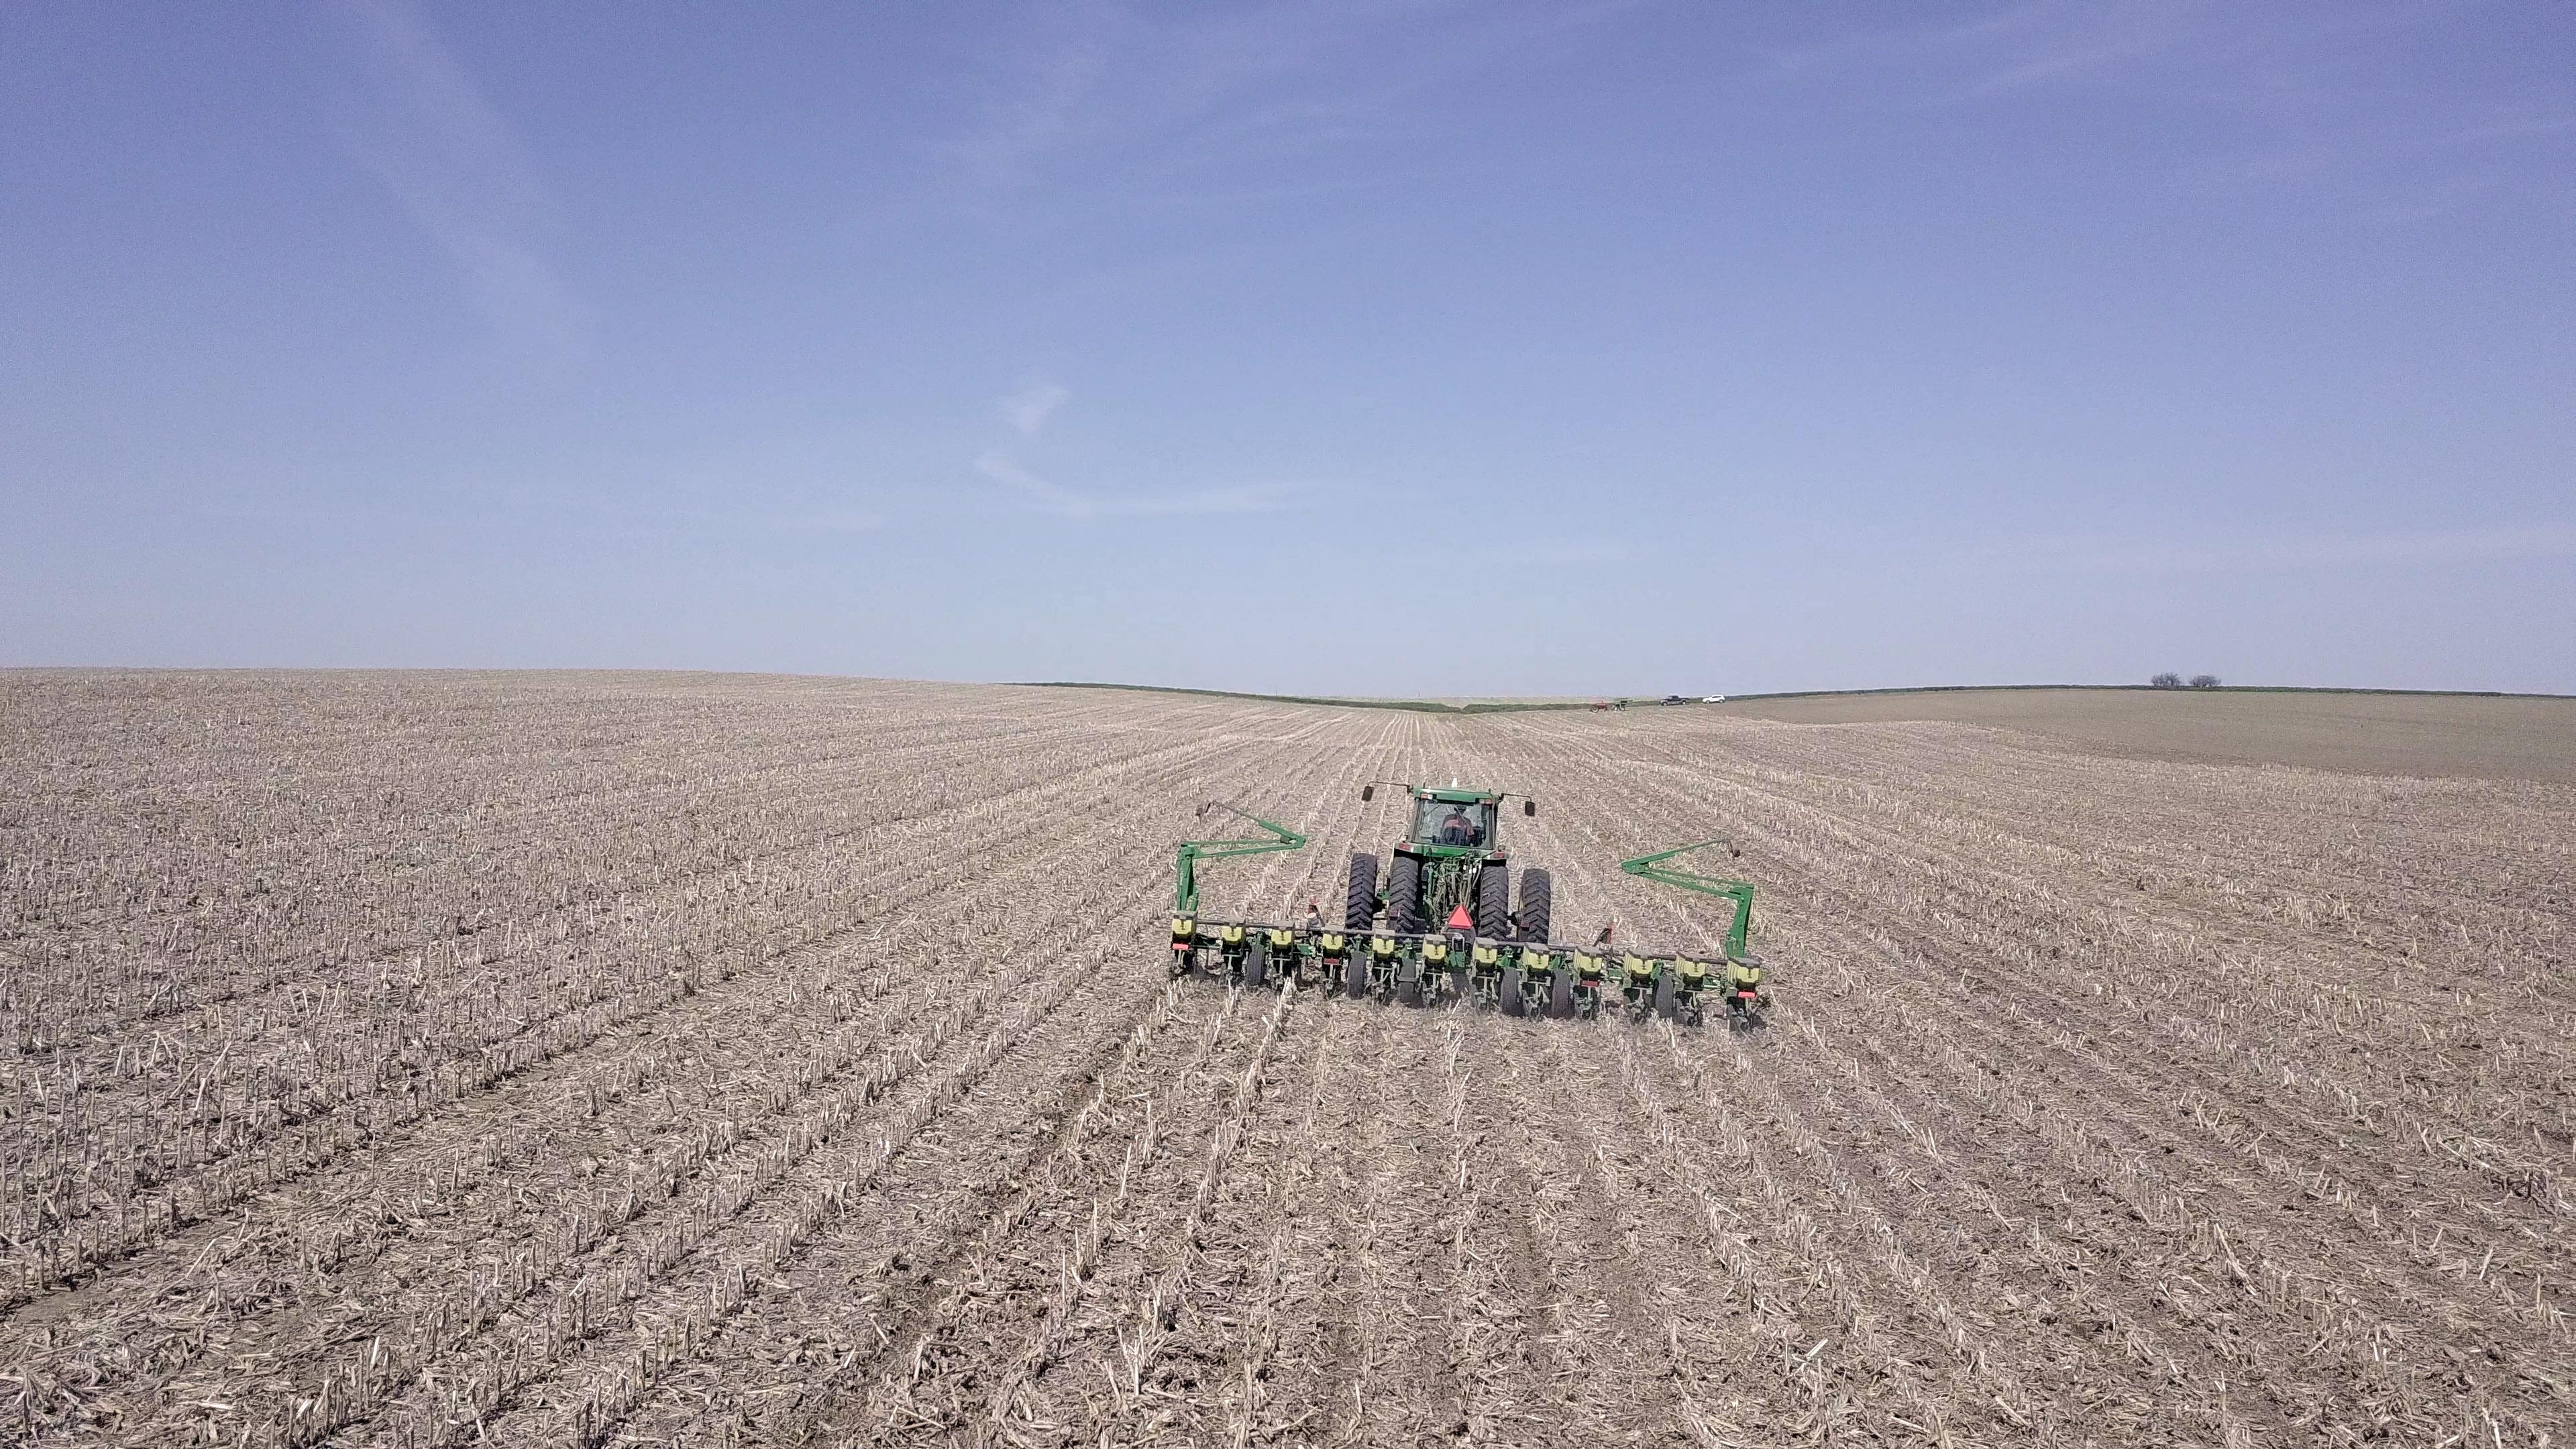 prepping-for-planting-season